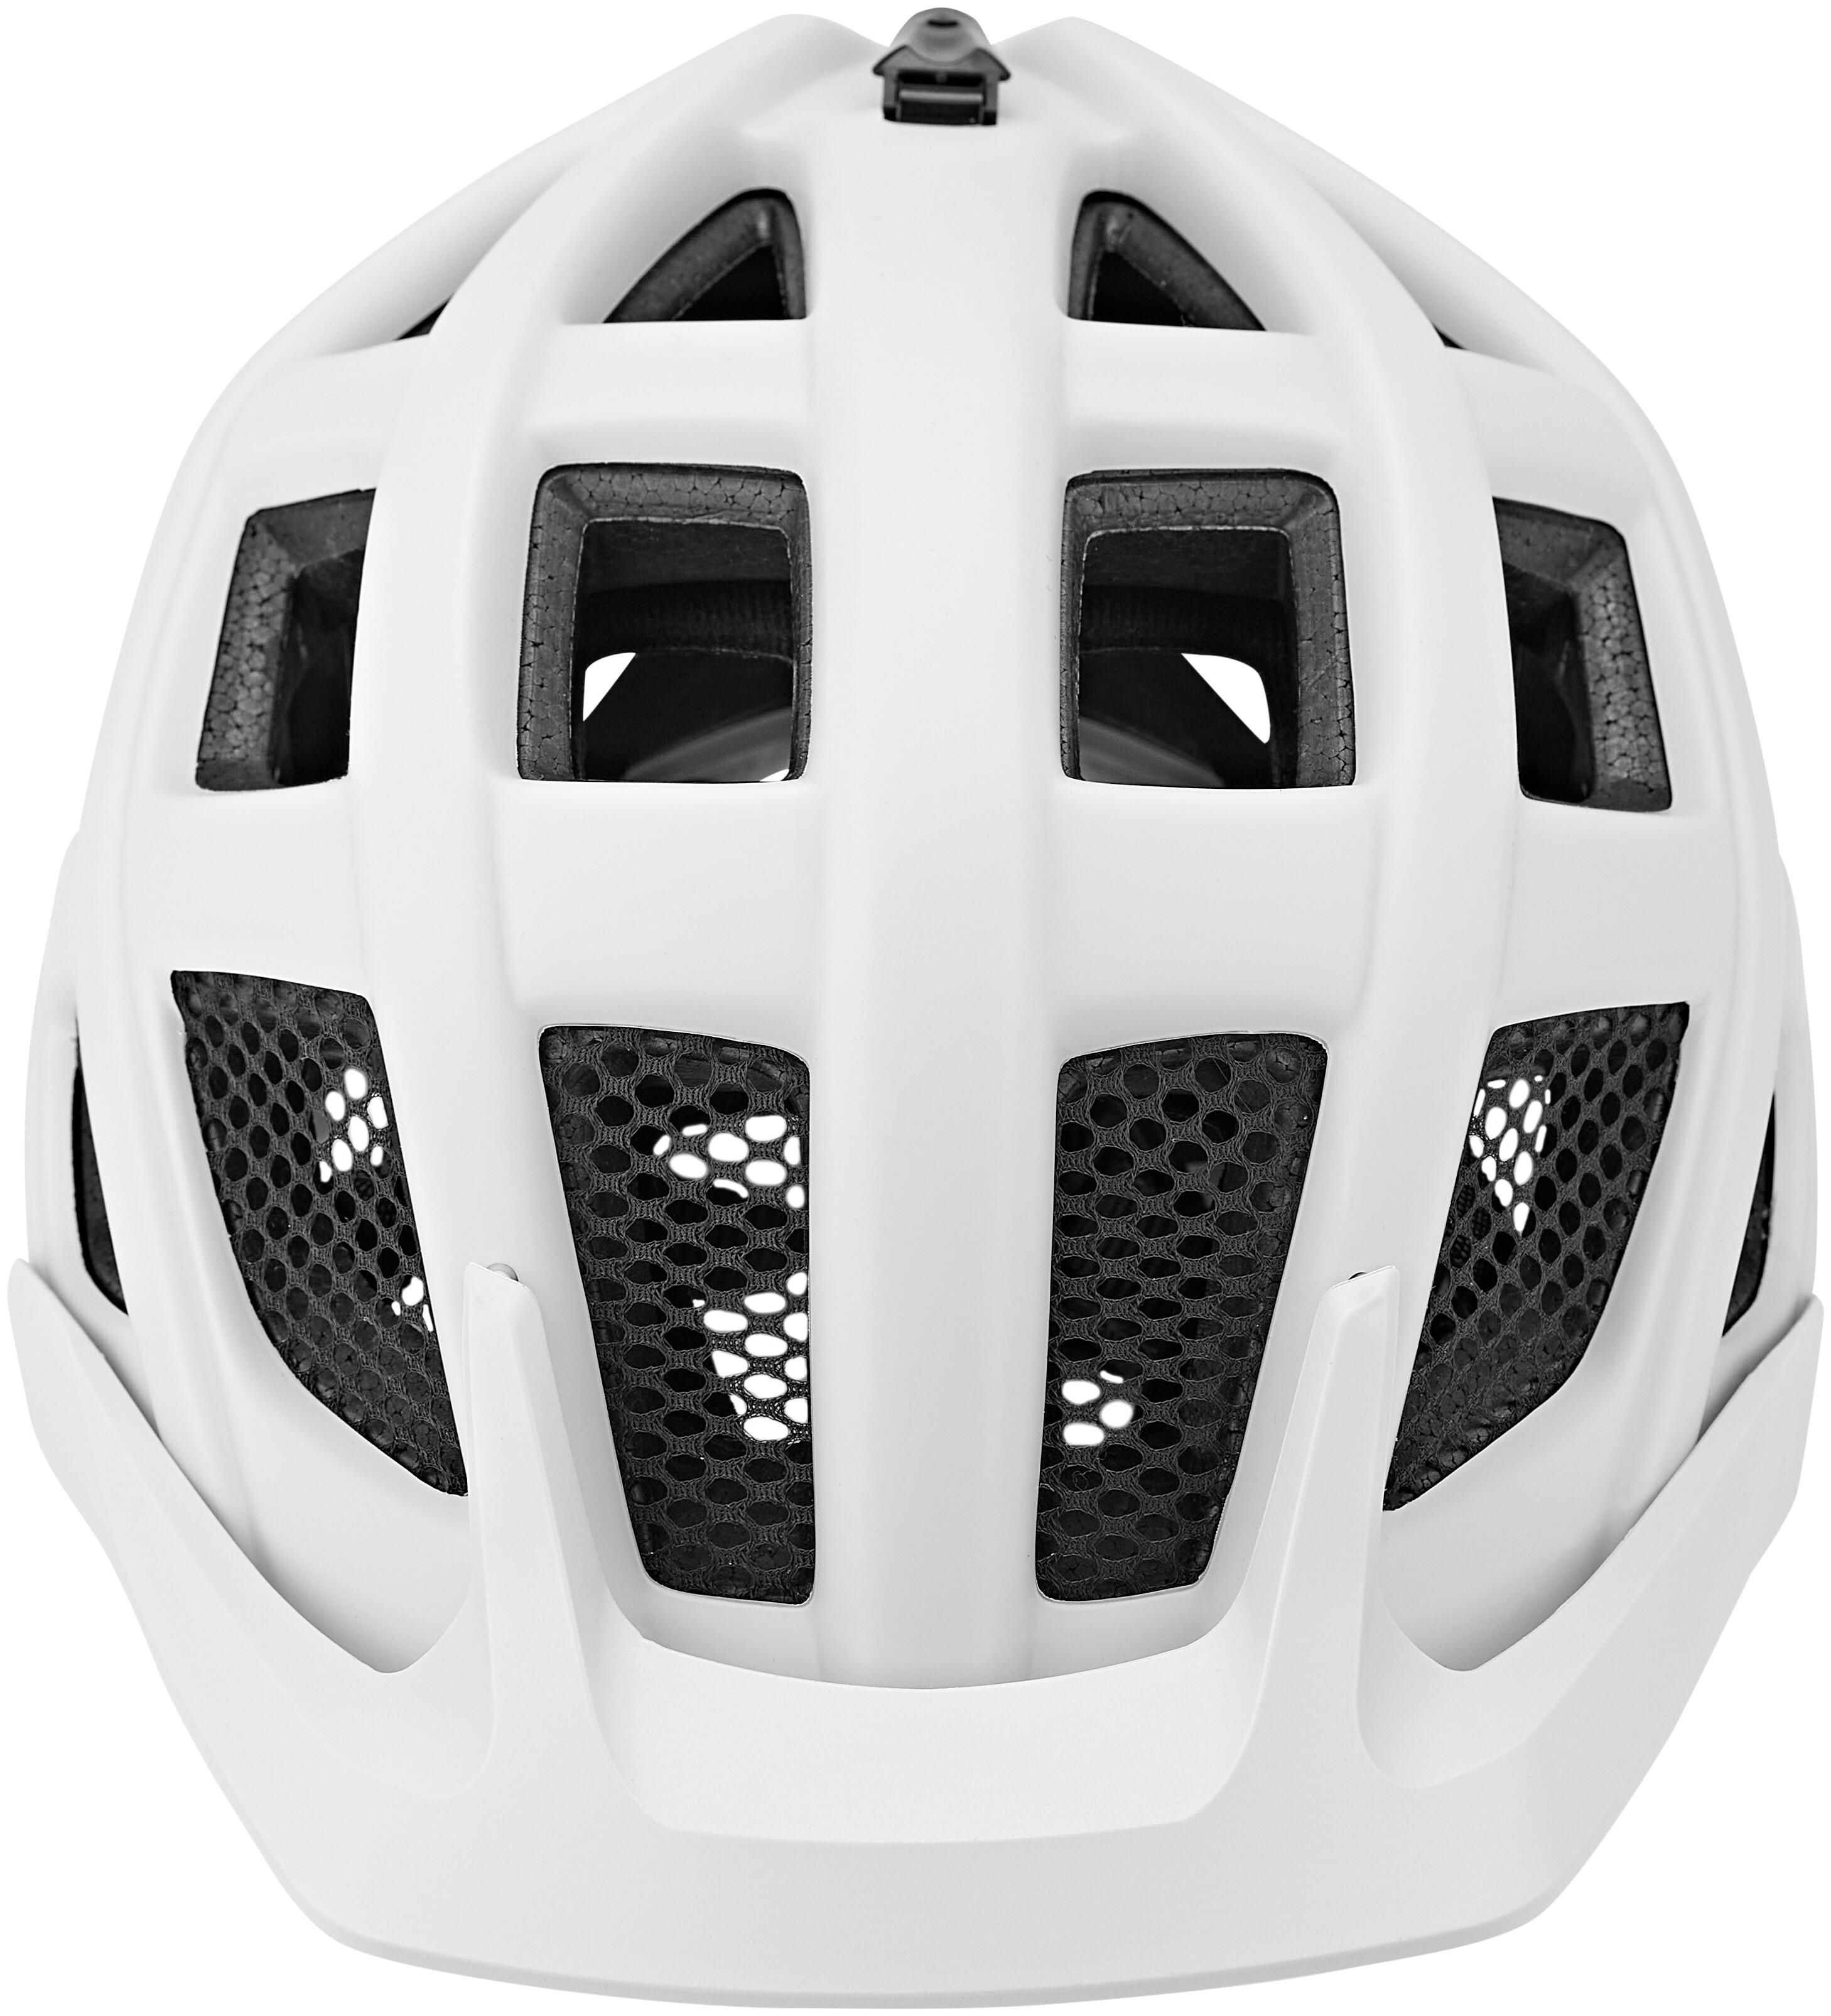 KED Fahrradhelm Trailon Camouflage black anthrazit matt L 56–62cm11403908036